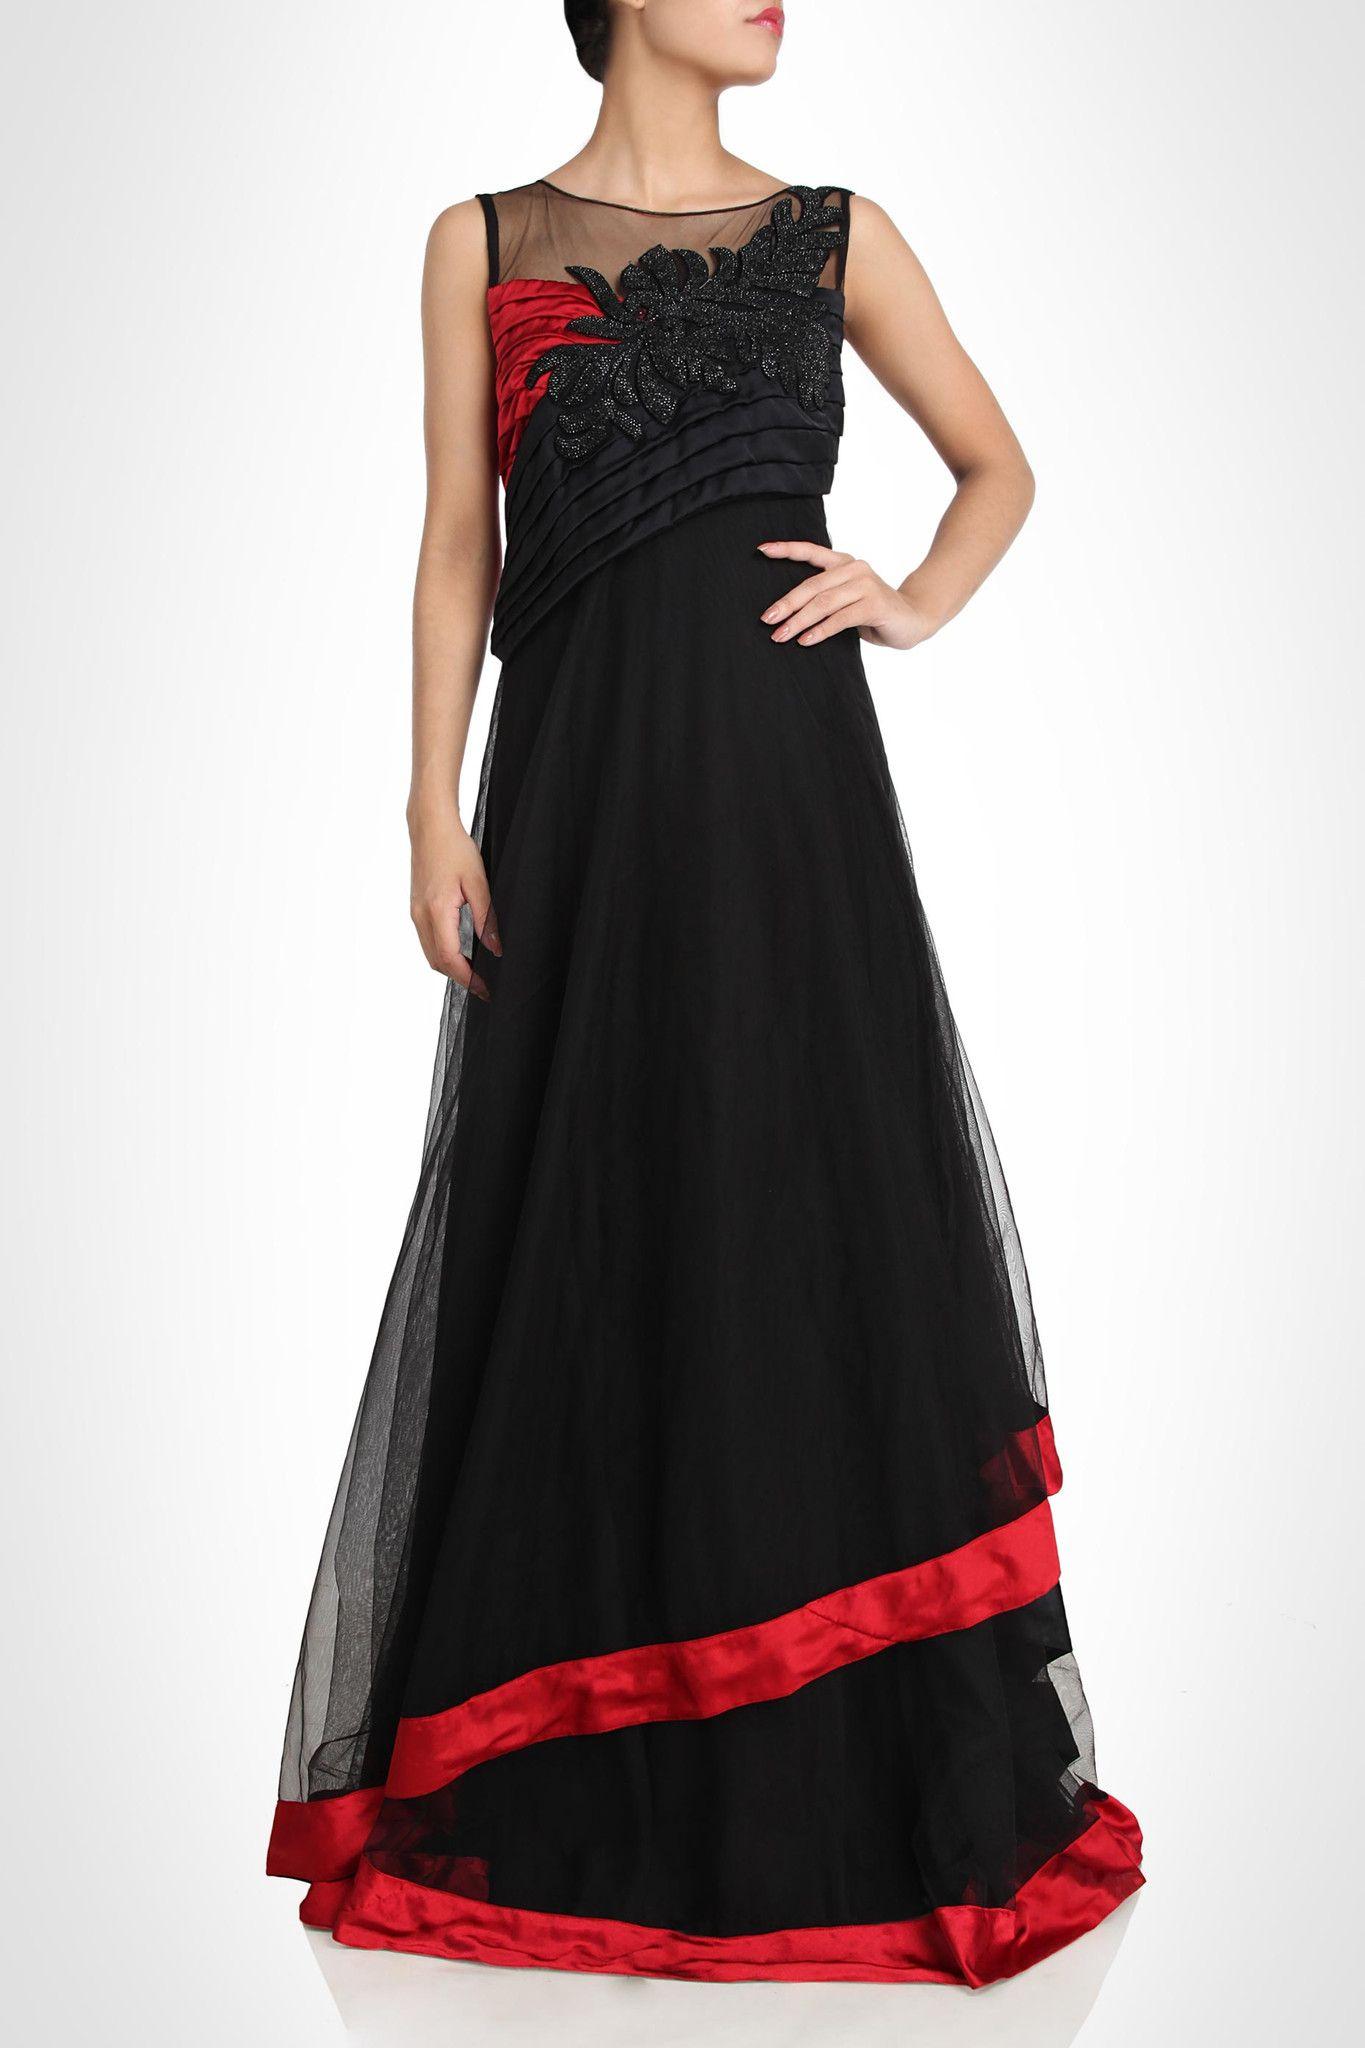 Color Designer black color designer gown – panache haute couture http